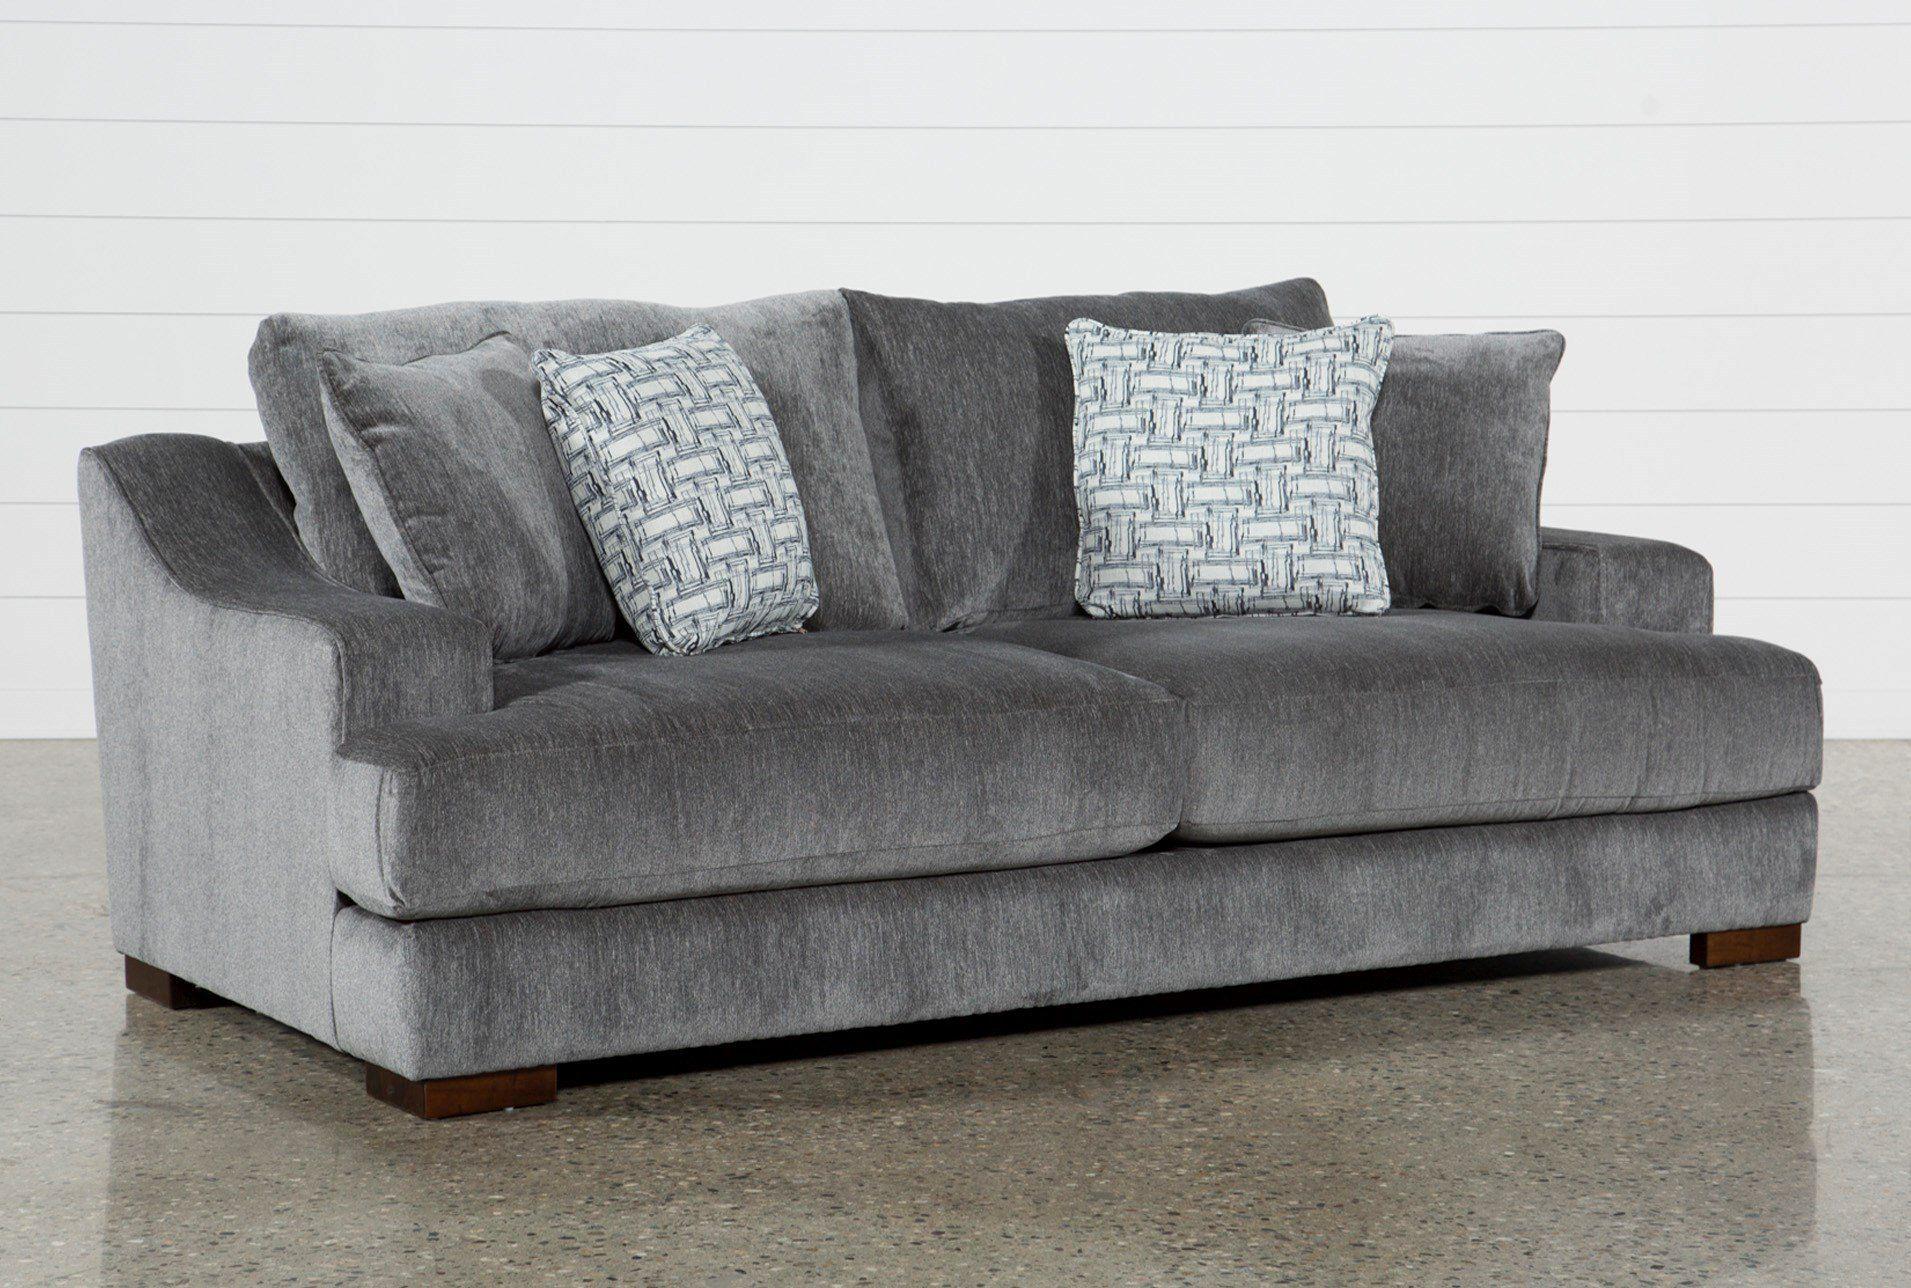 Shop For Maddox Sofa At Livingspaces Com Enjoy Free Store Pick Up